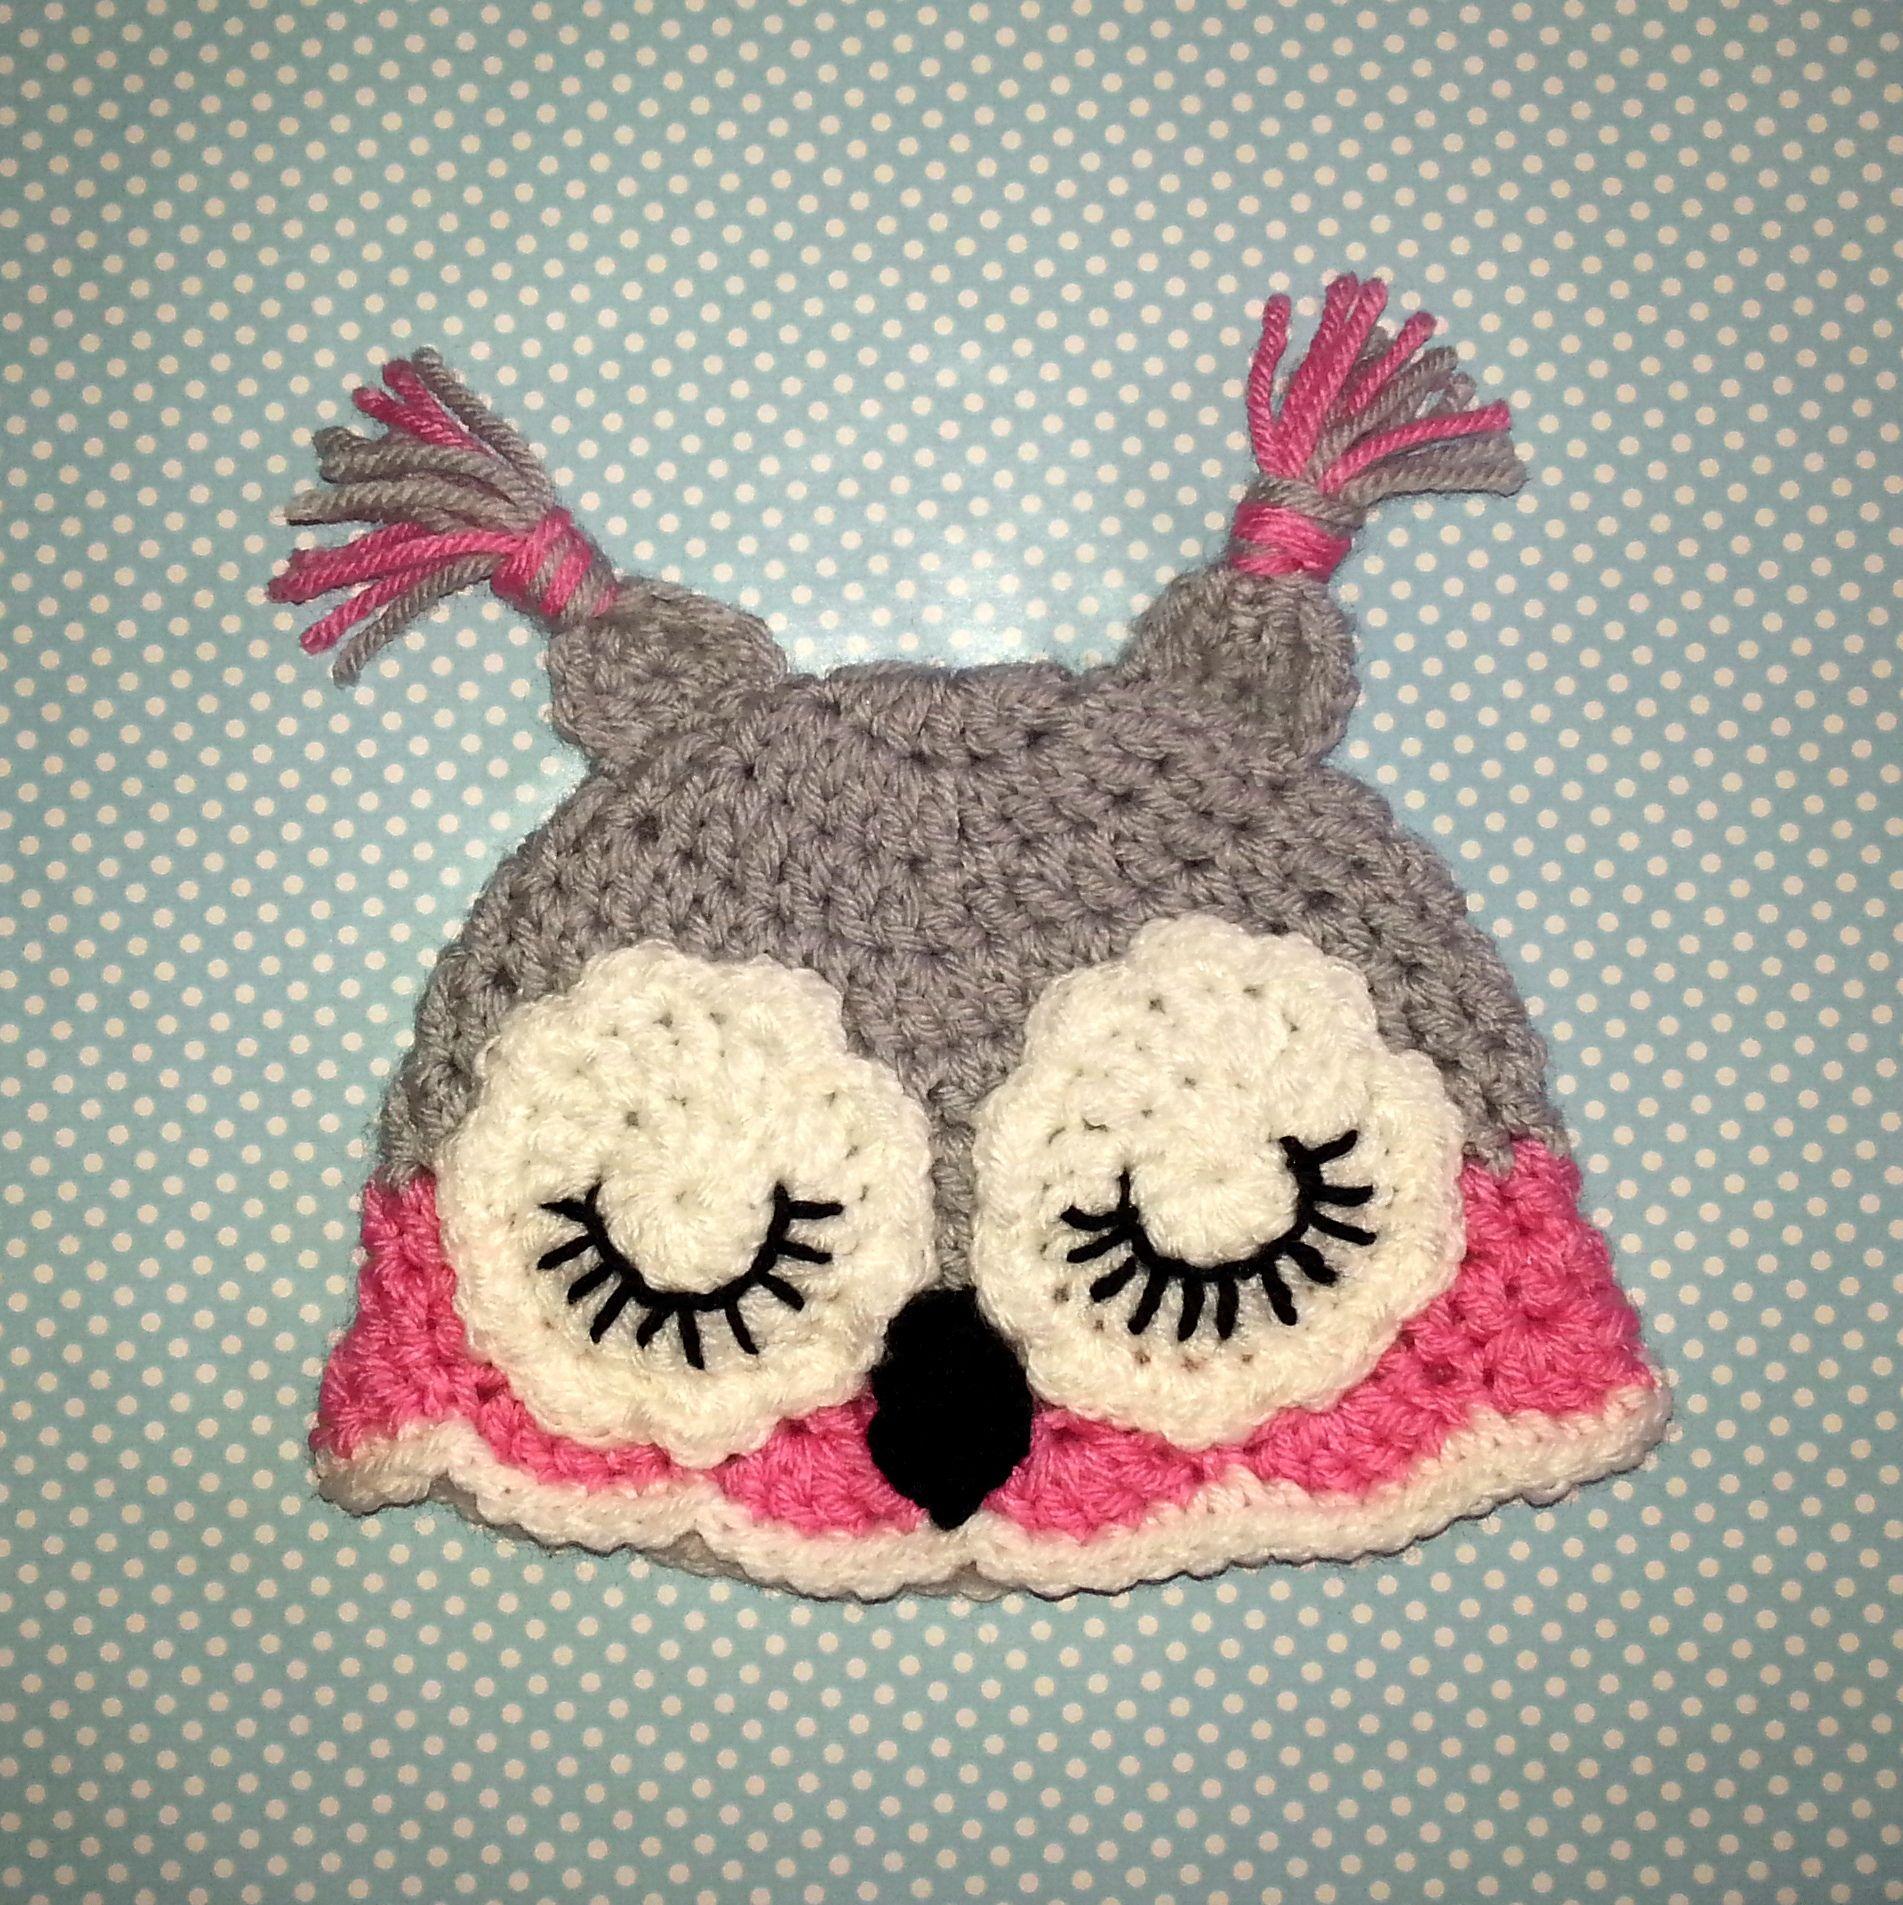 Crochet baby girl owl hat crochet pinterest baby girl owl crochet baby girl owl hat bankloansurffo Image collections